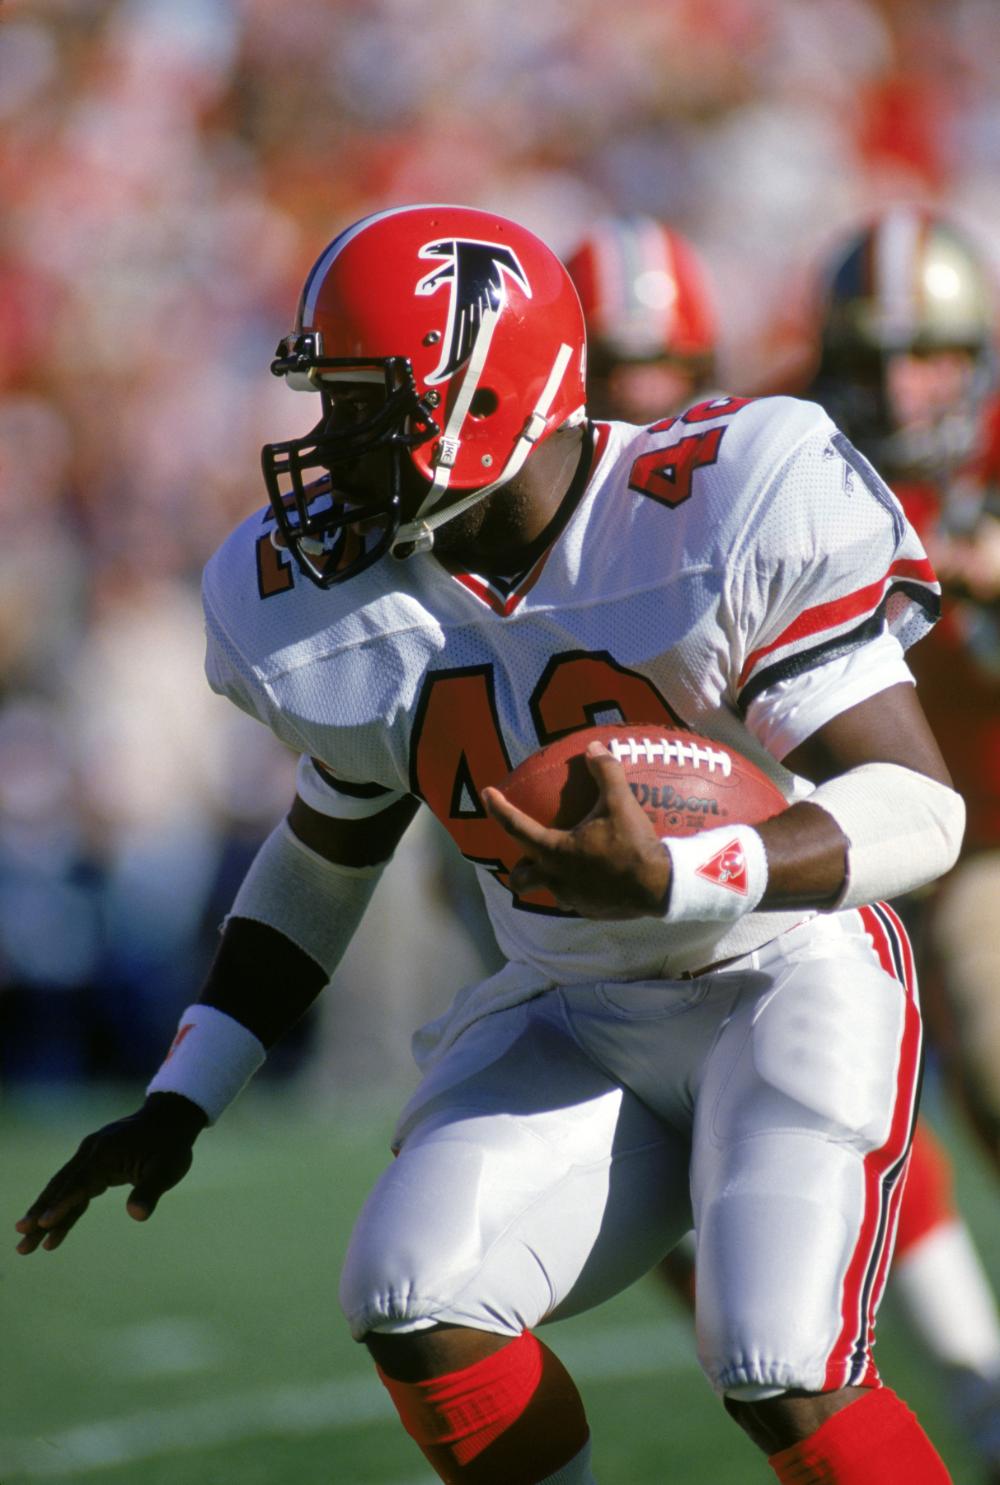 Nfl Power Rankings Greatest Running In 2020 Falcons Football Atlanta Falcons Logo Nfl